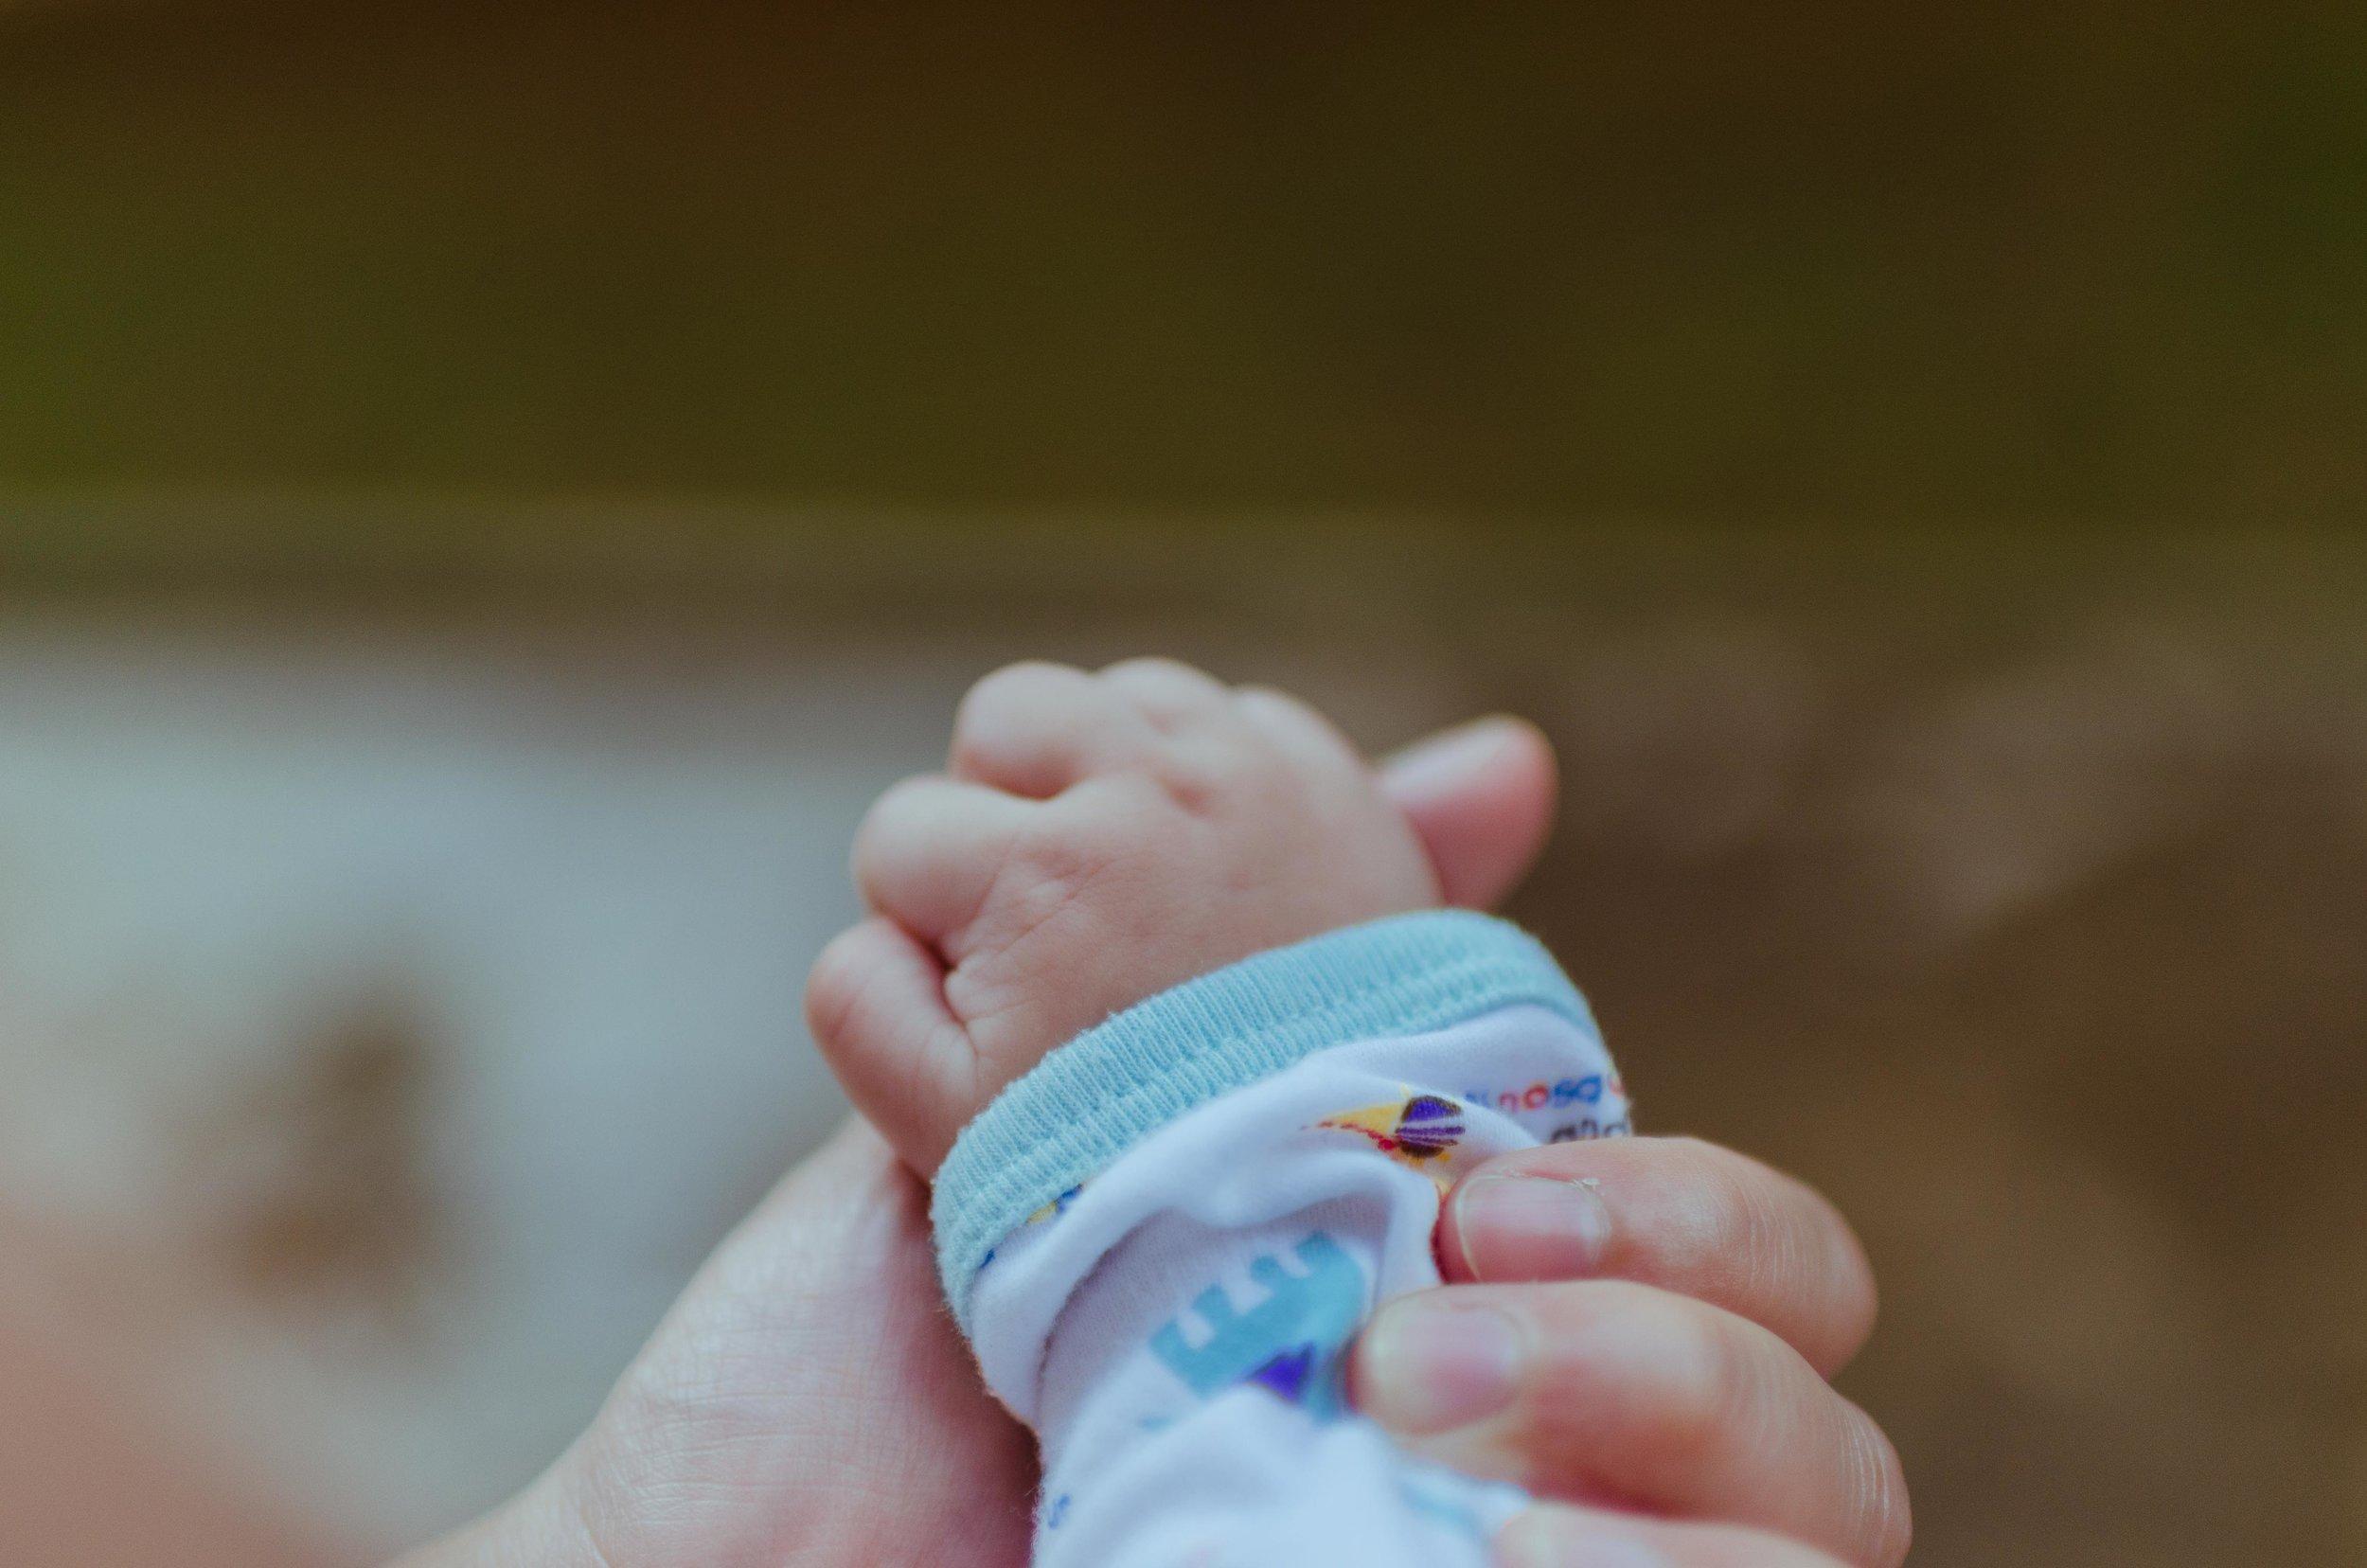 holding-infant's-hand-joy-life-surprise-wonder